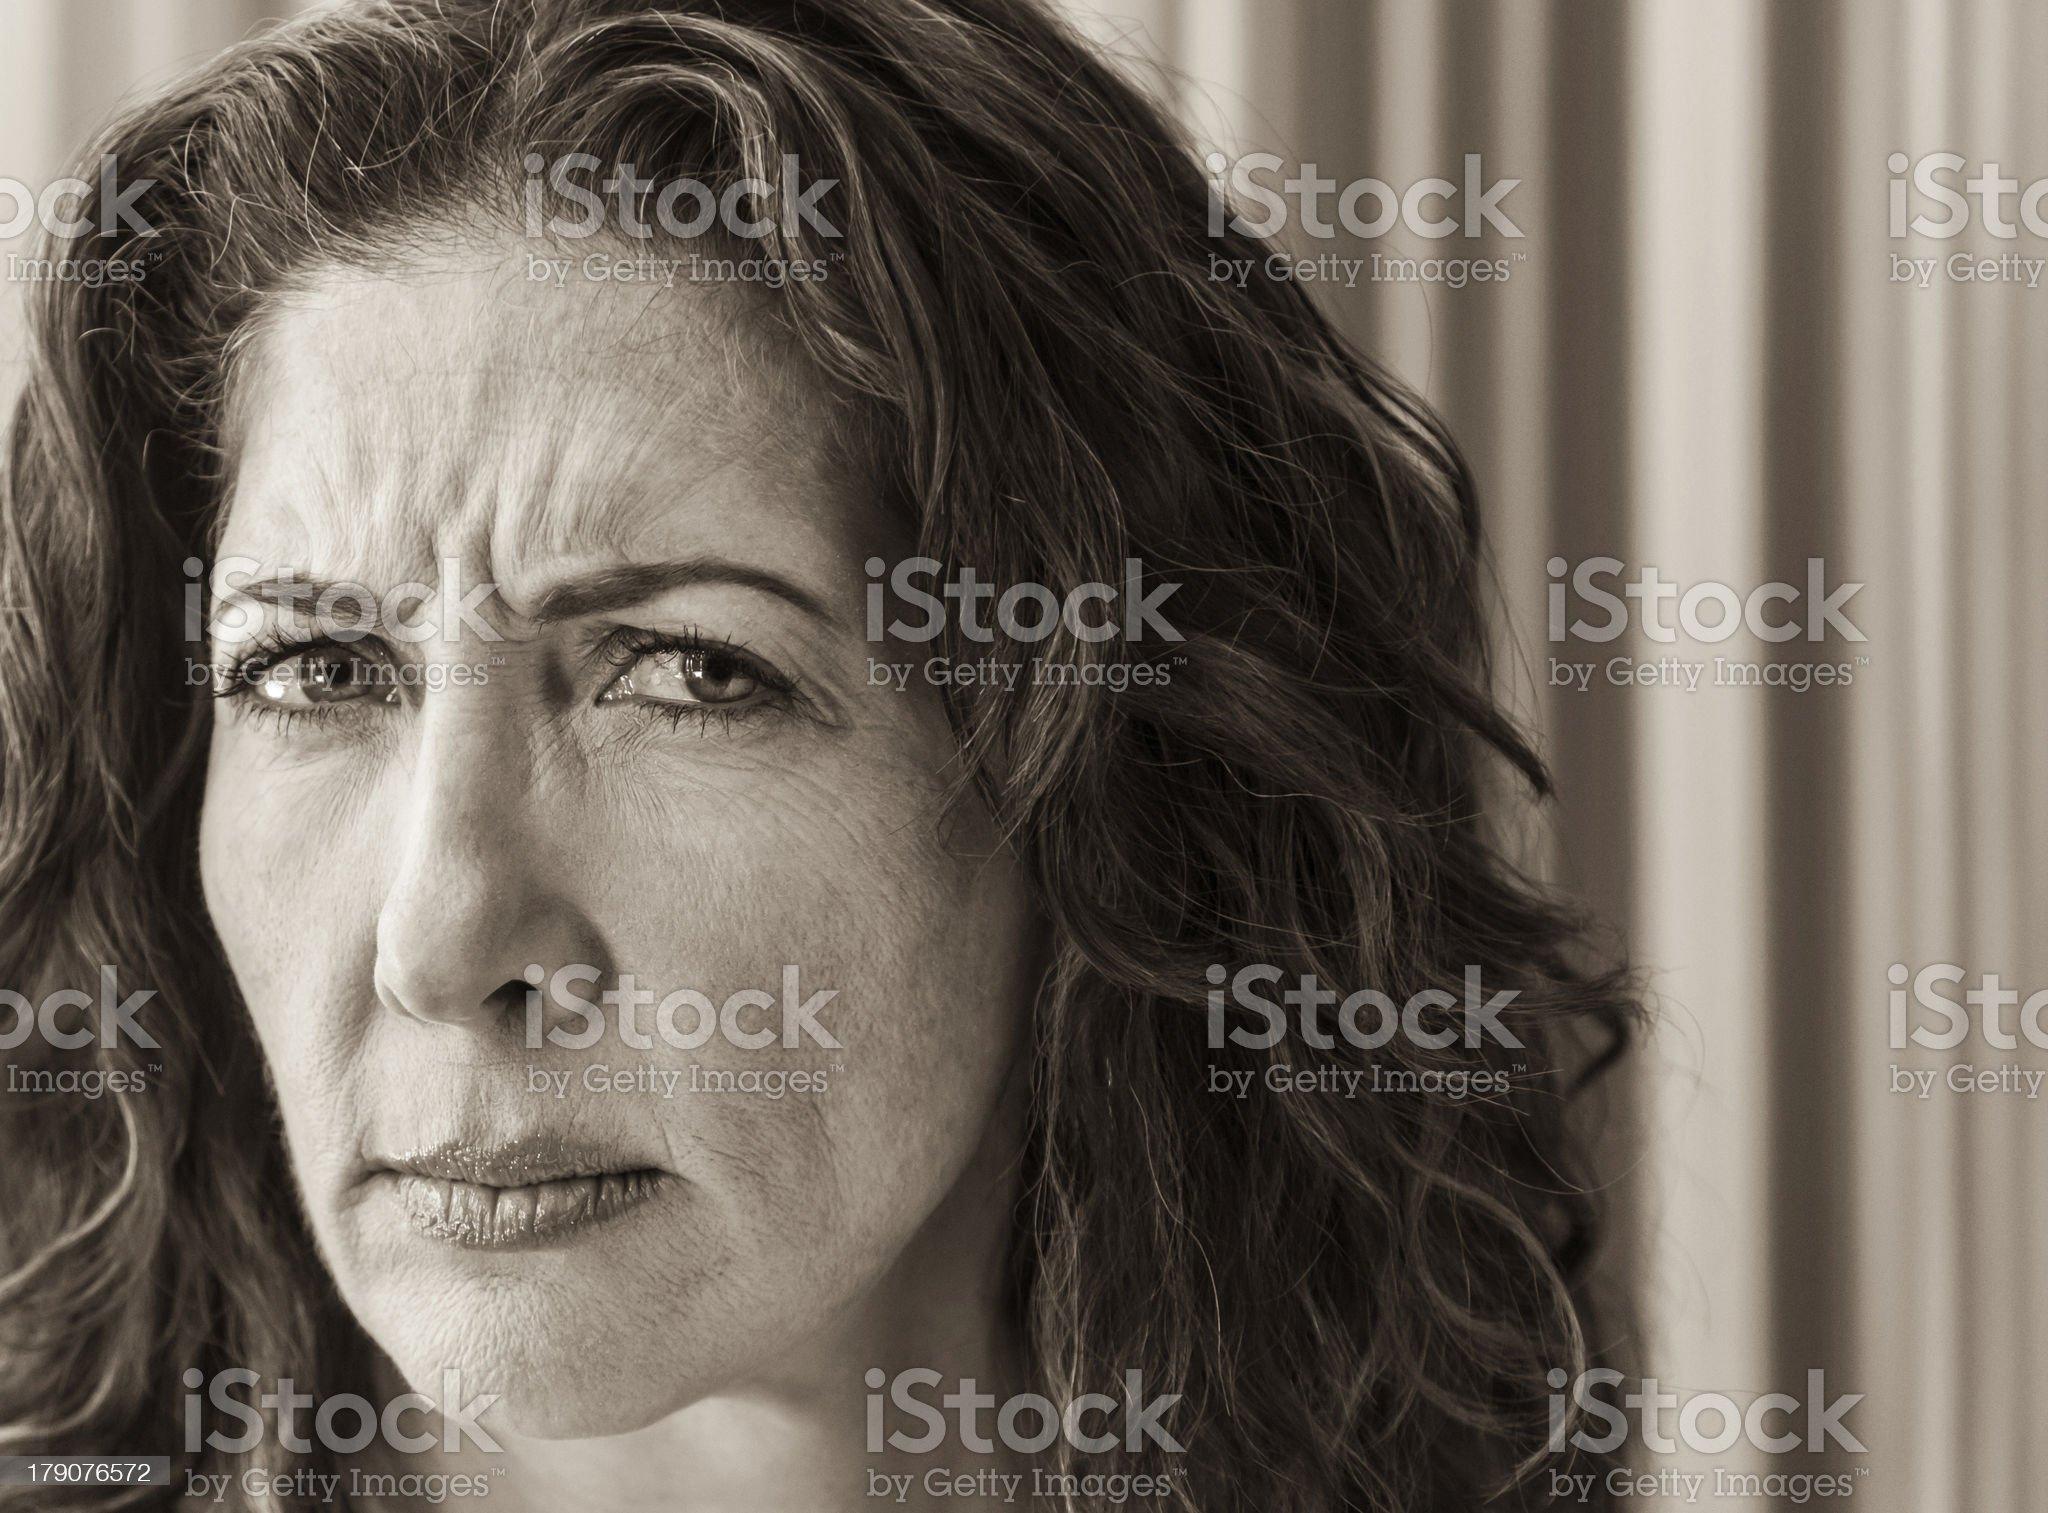 Stern Woman Portrait royalty-free stock photo